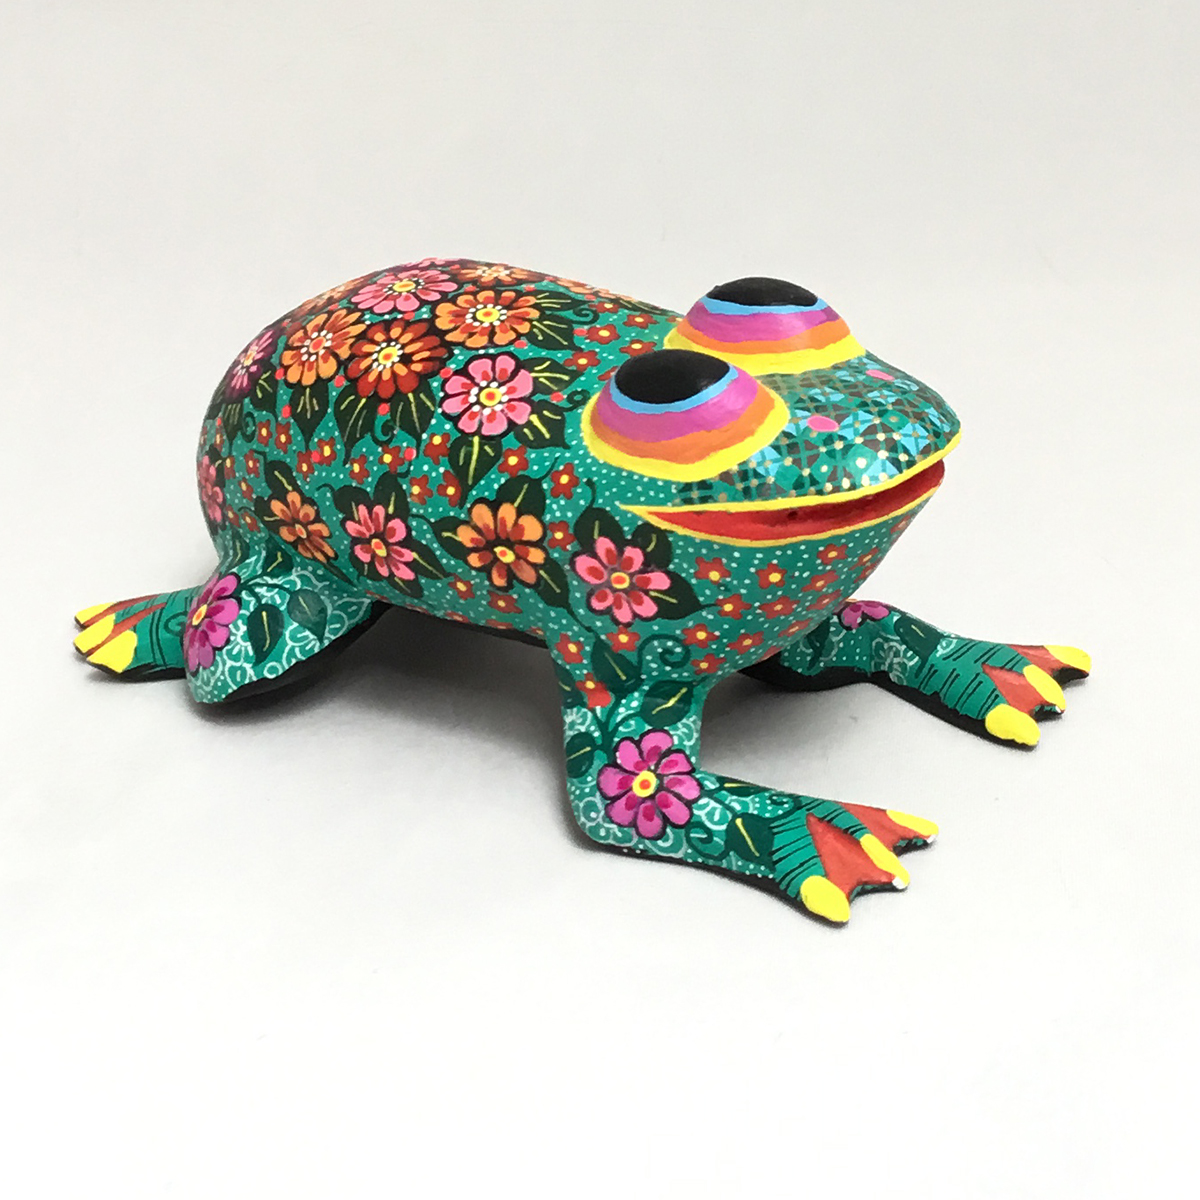 Candido Jimenez Ojeda Candido Jimenez Ojeda: Floral Frog Alebrijes